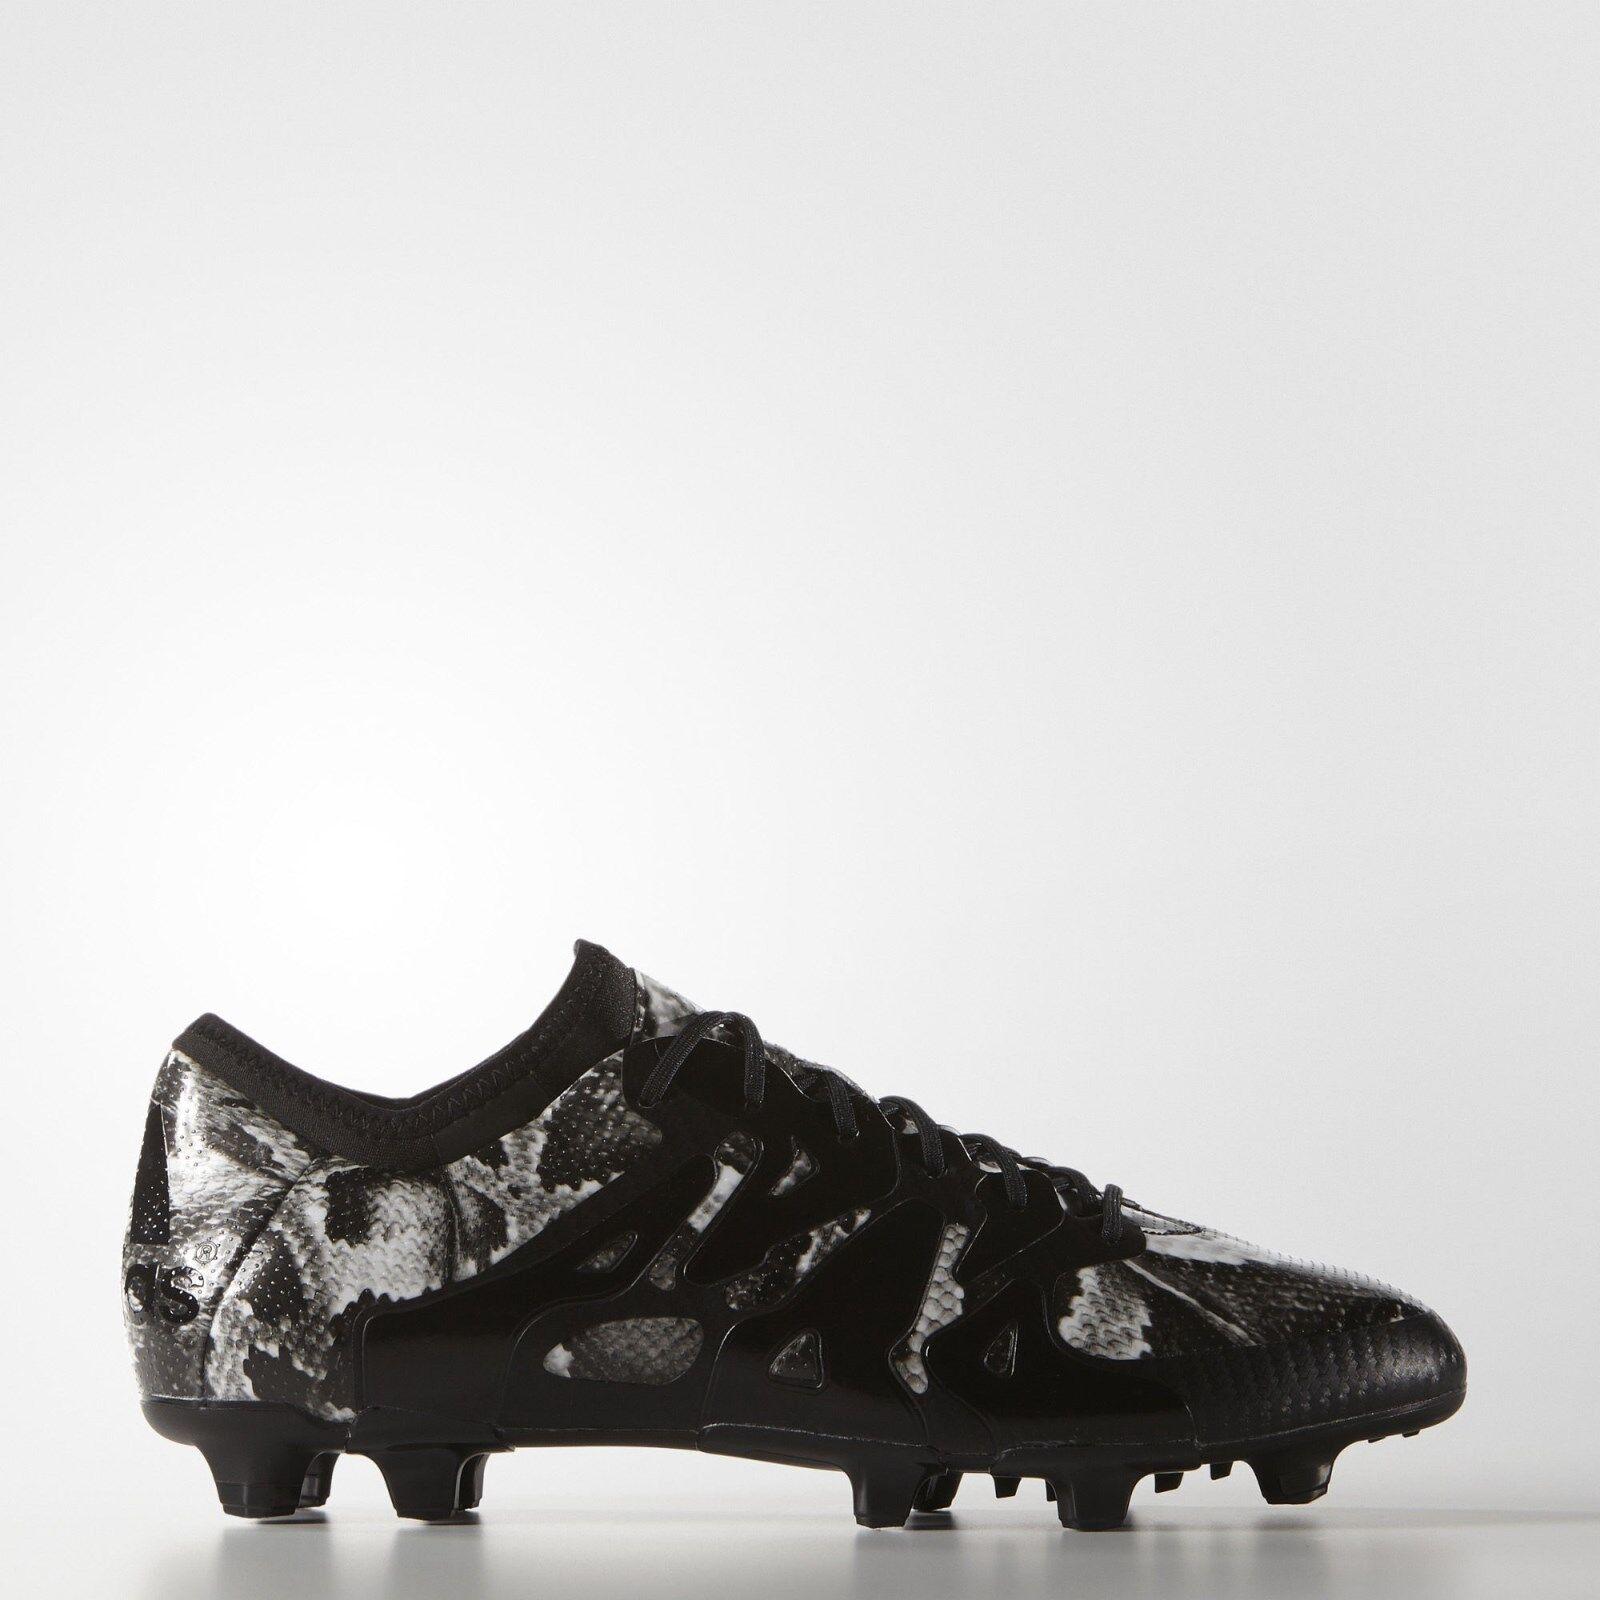 Adidas Men Football X 15.1 Deadly Focus FG Boots Men Aq5354 size